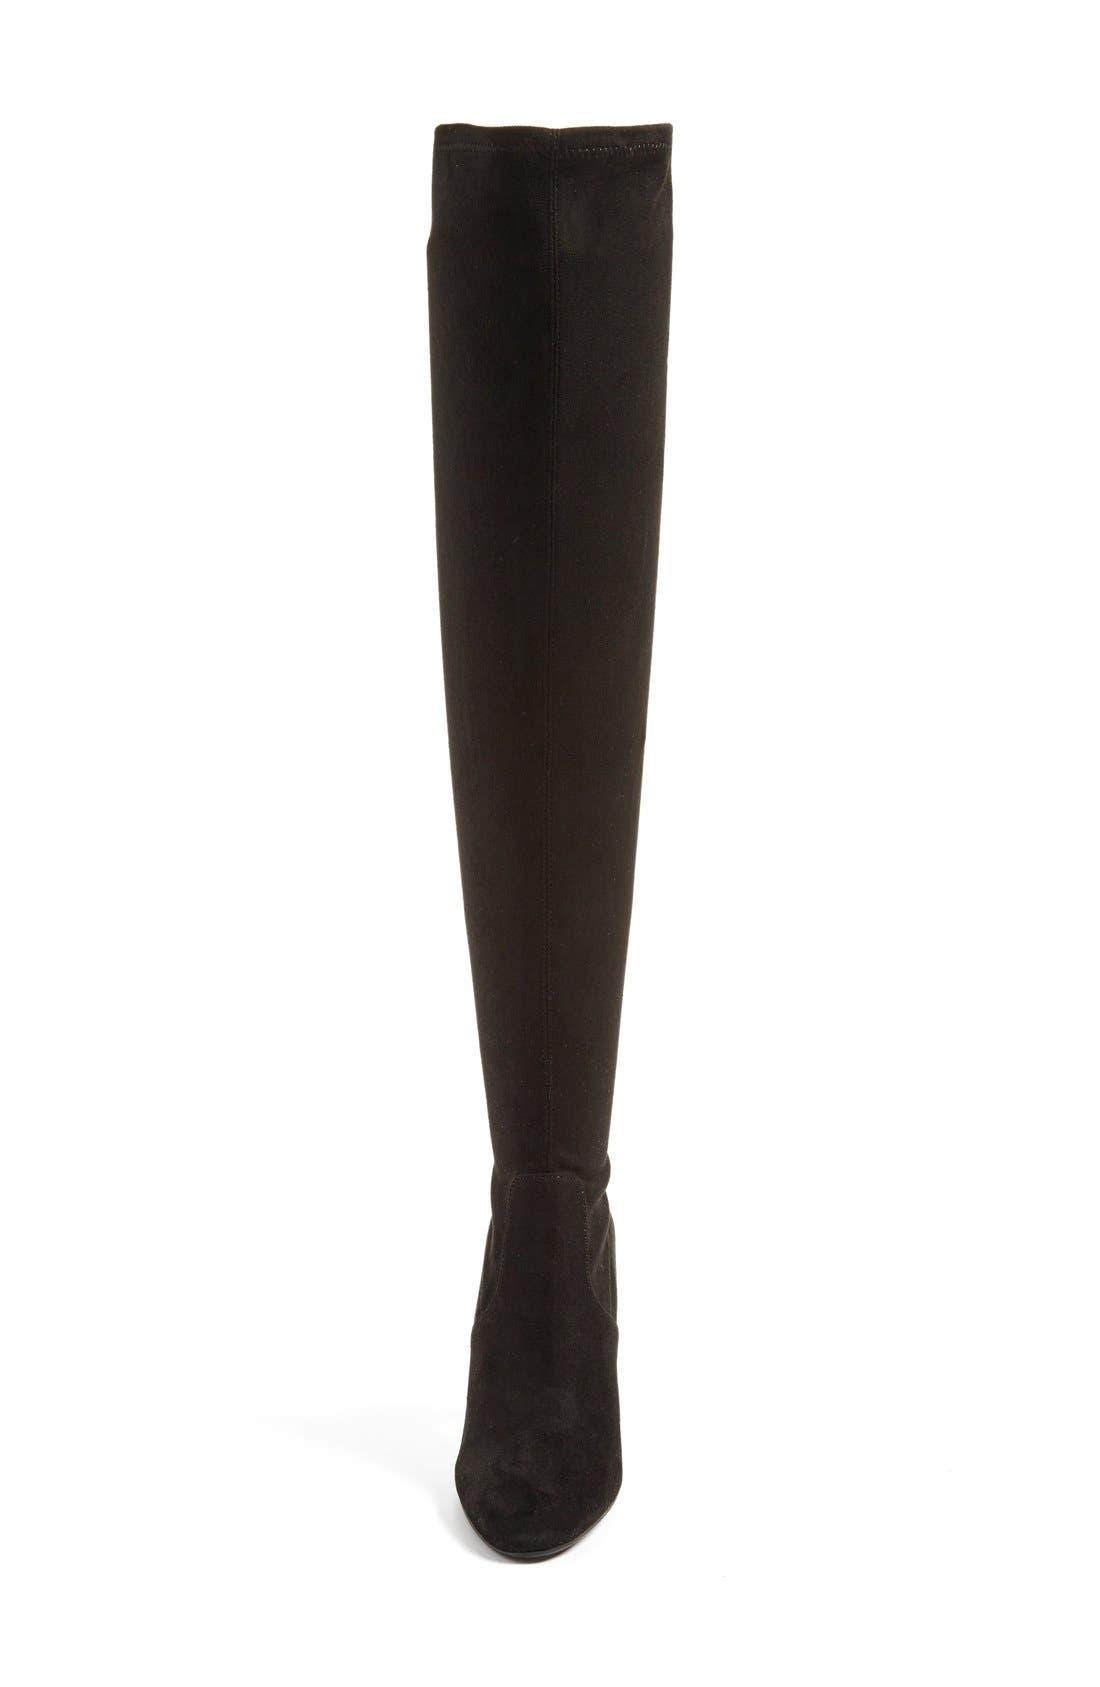 Alternate Image 3  - Steve Madden 'Emotions' Stretch Over the Knee Boot (Women)